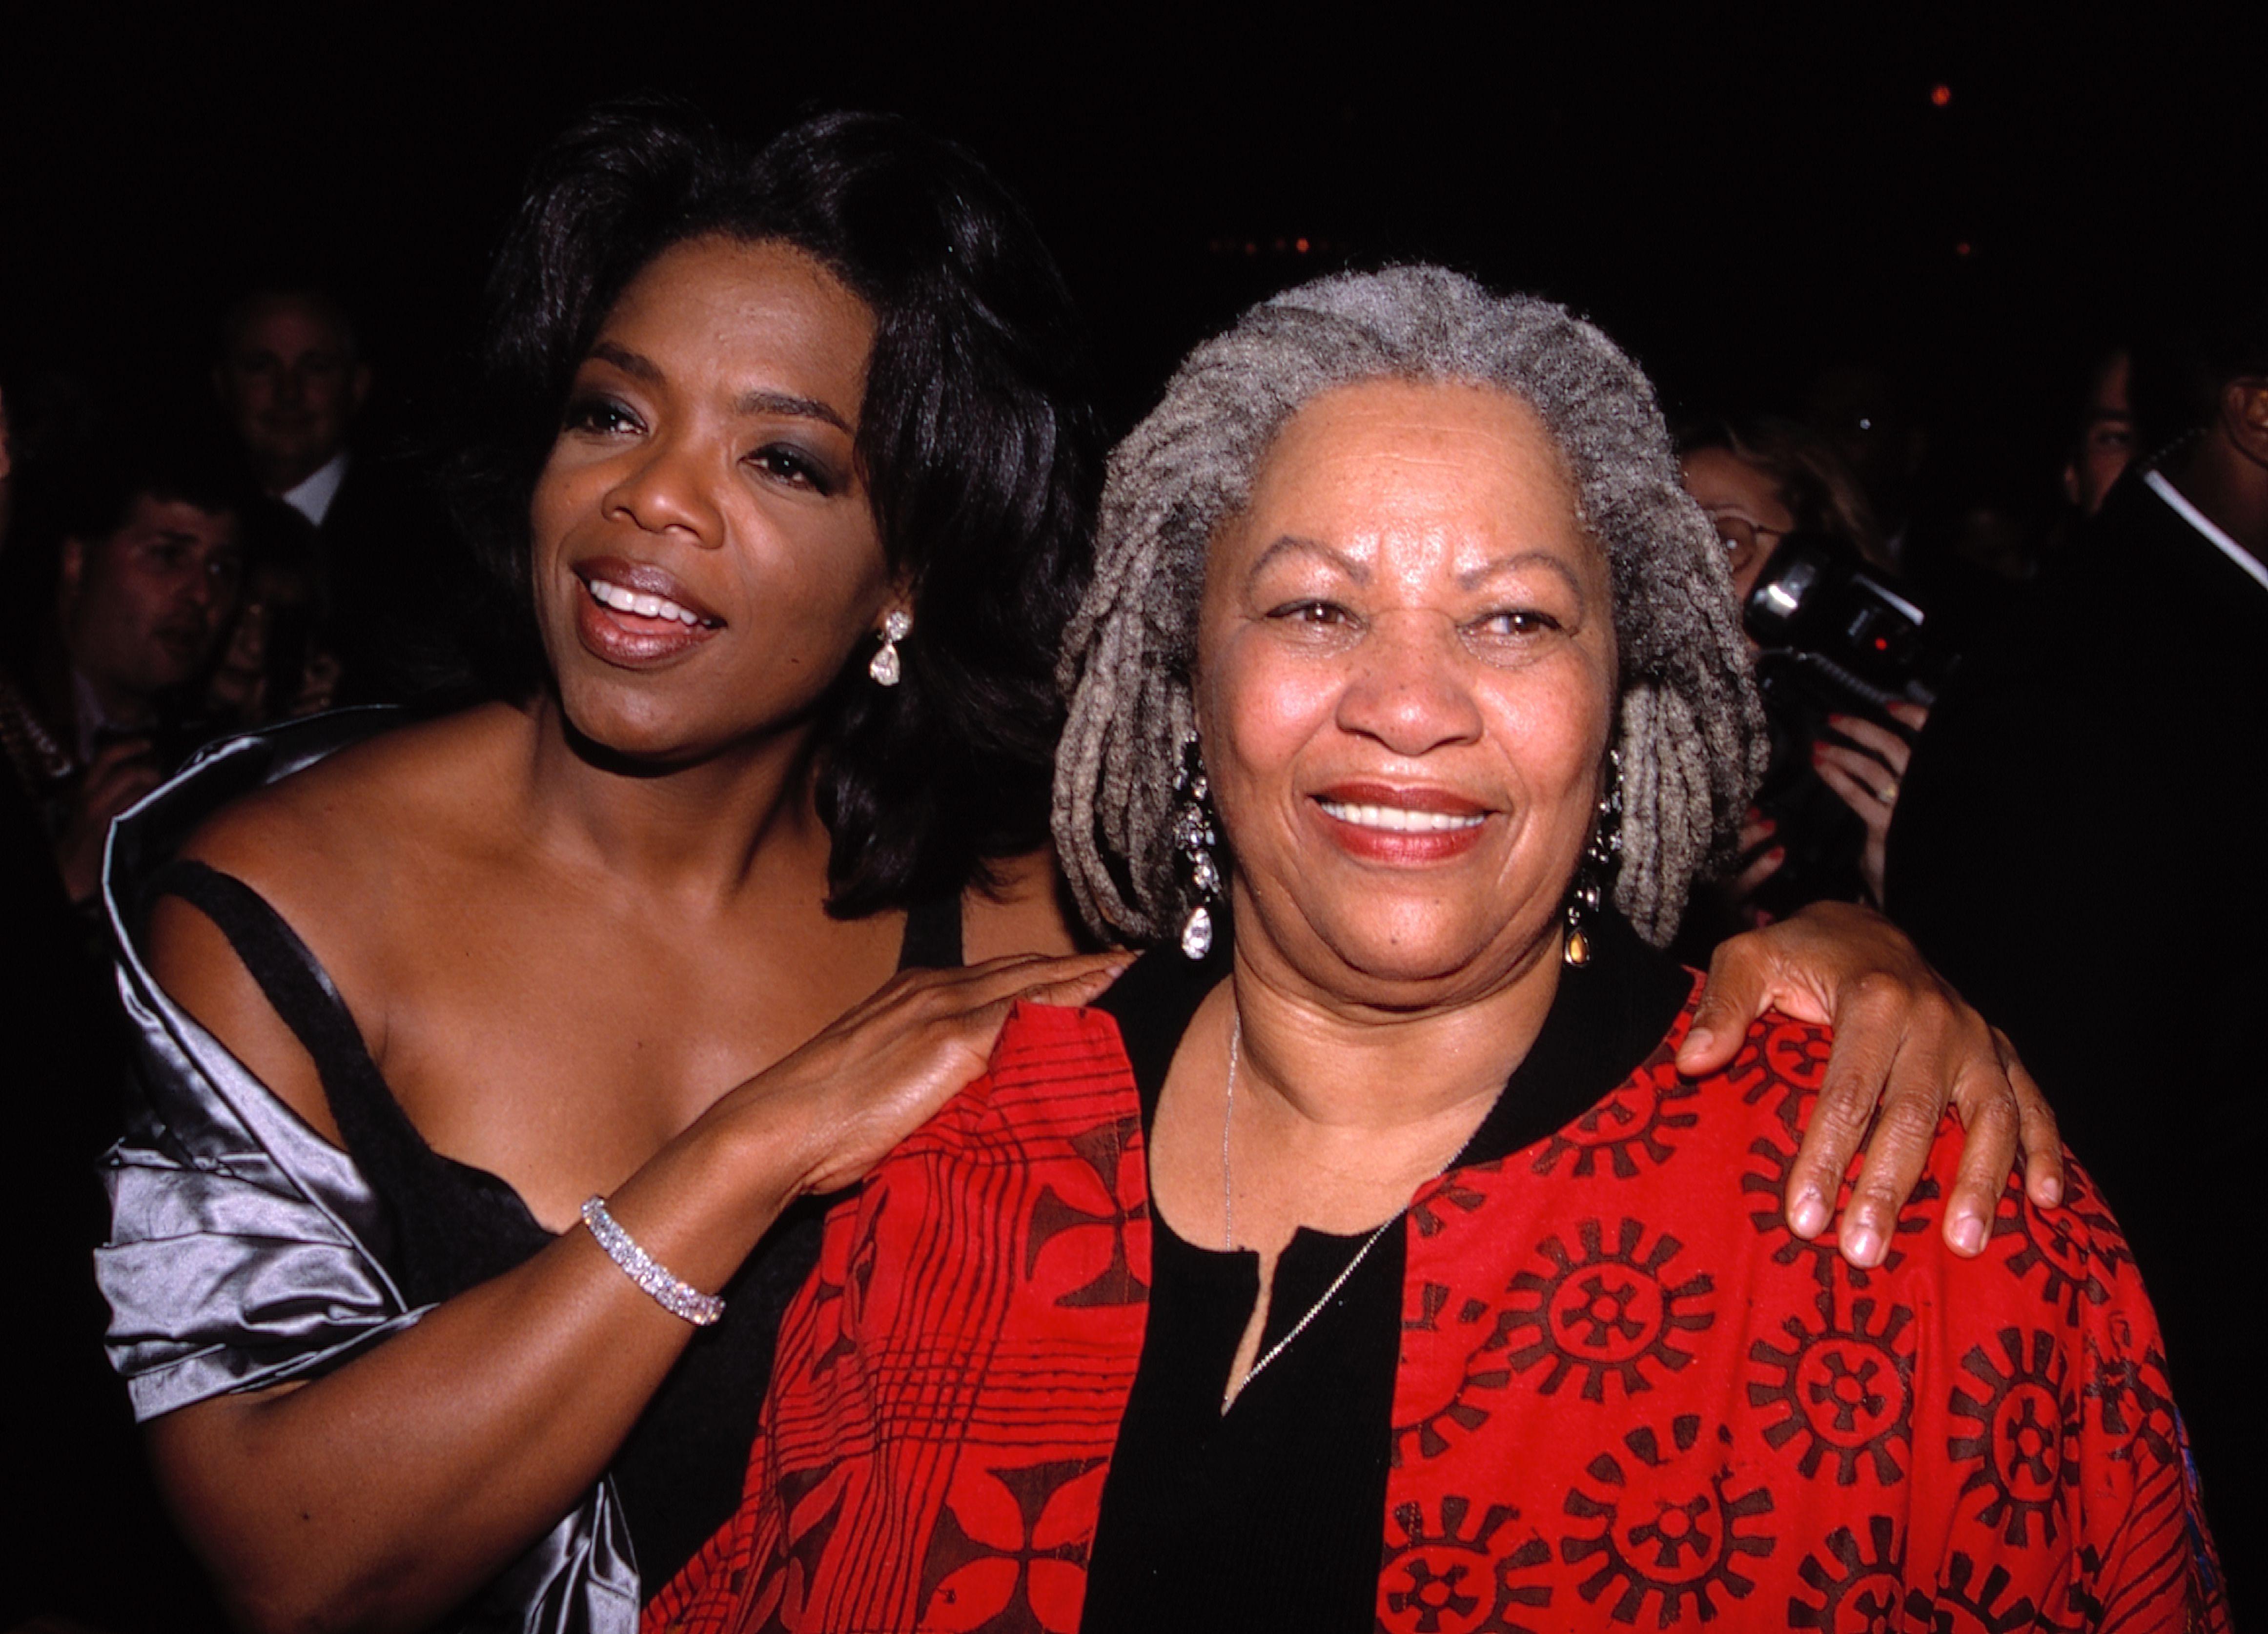 Mandatory Credit: Photo by MediaPunch/Shutterstock (10355776d) Oprah Winfrey and Toni Morrison 'Beloved' film premiere, Los Angeles, USA - 1998